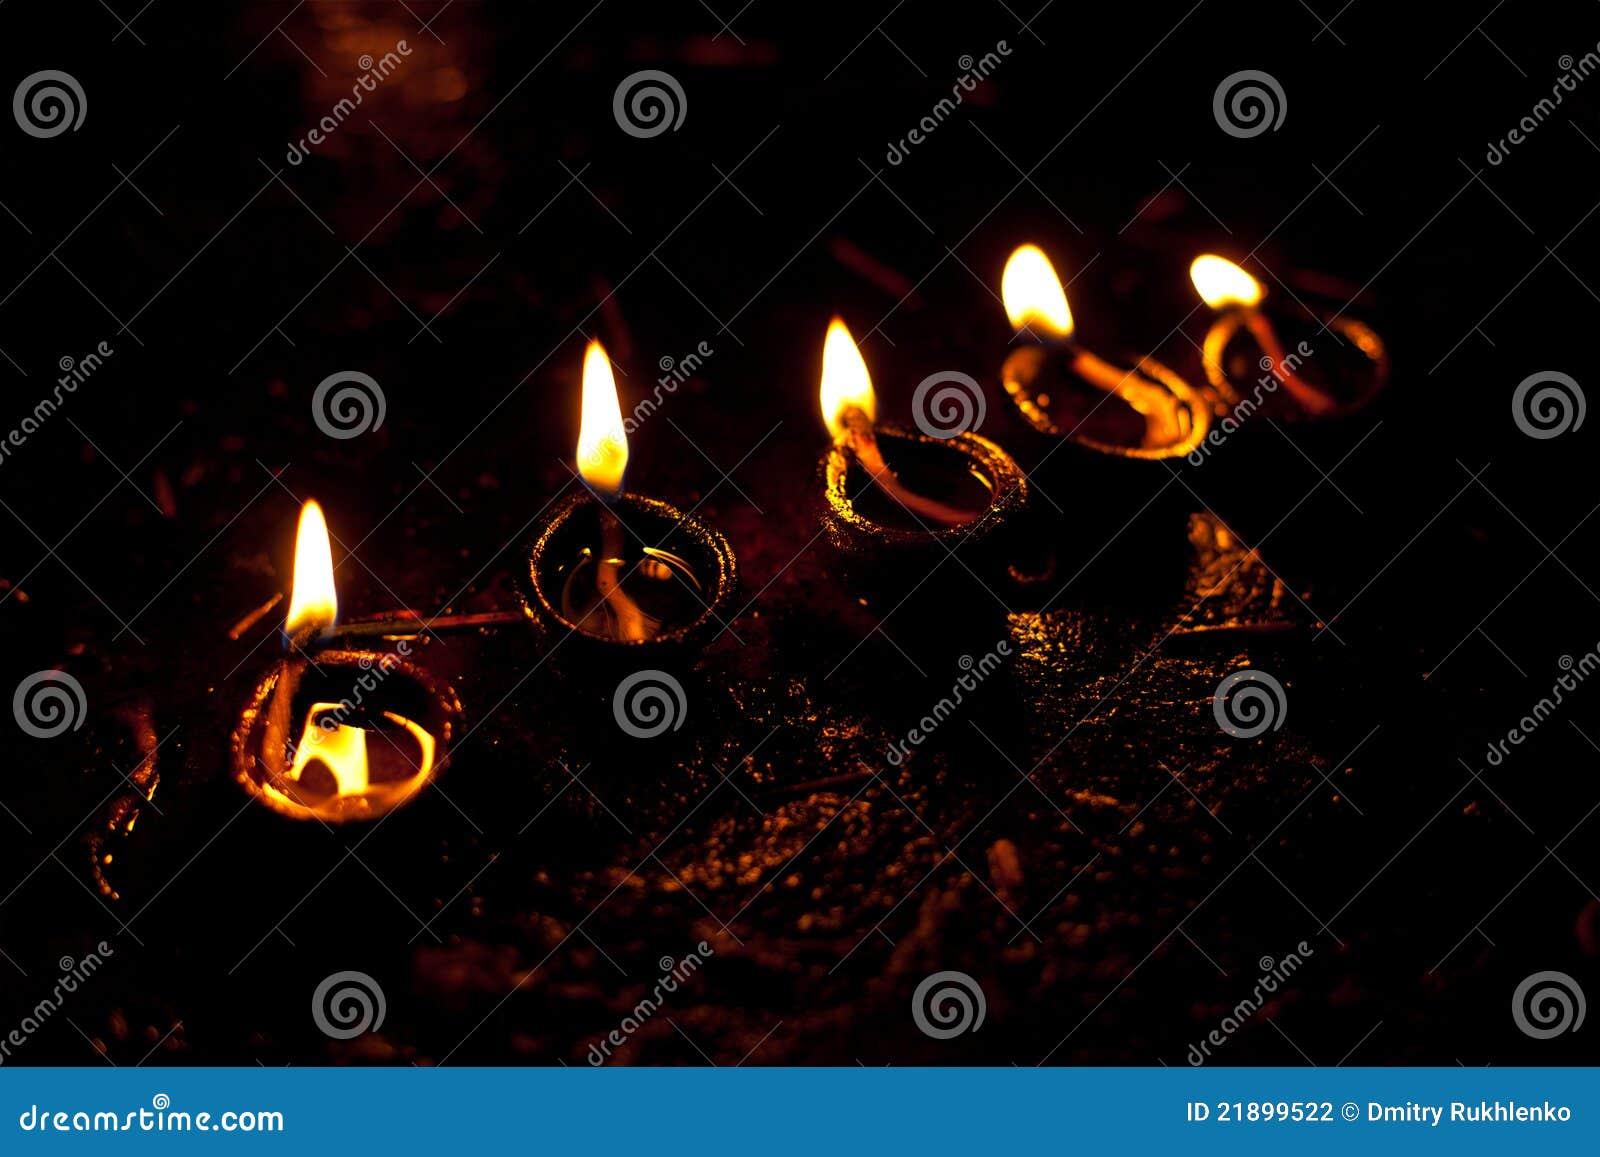 Diwali Lights Stock Photography - Image: 21899522